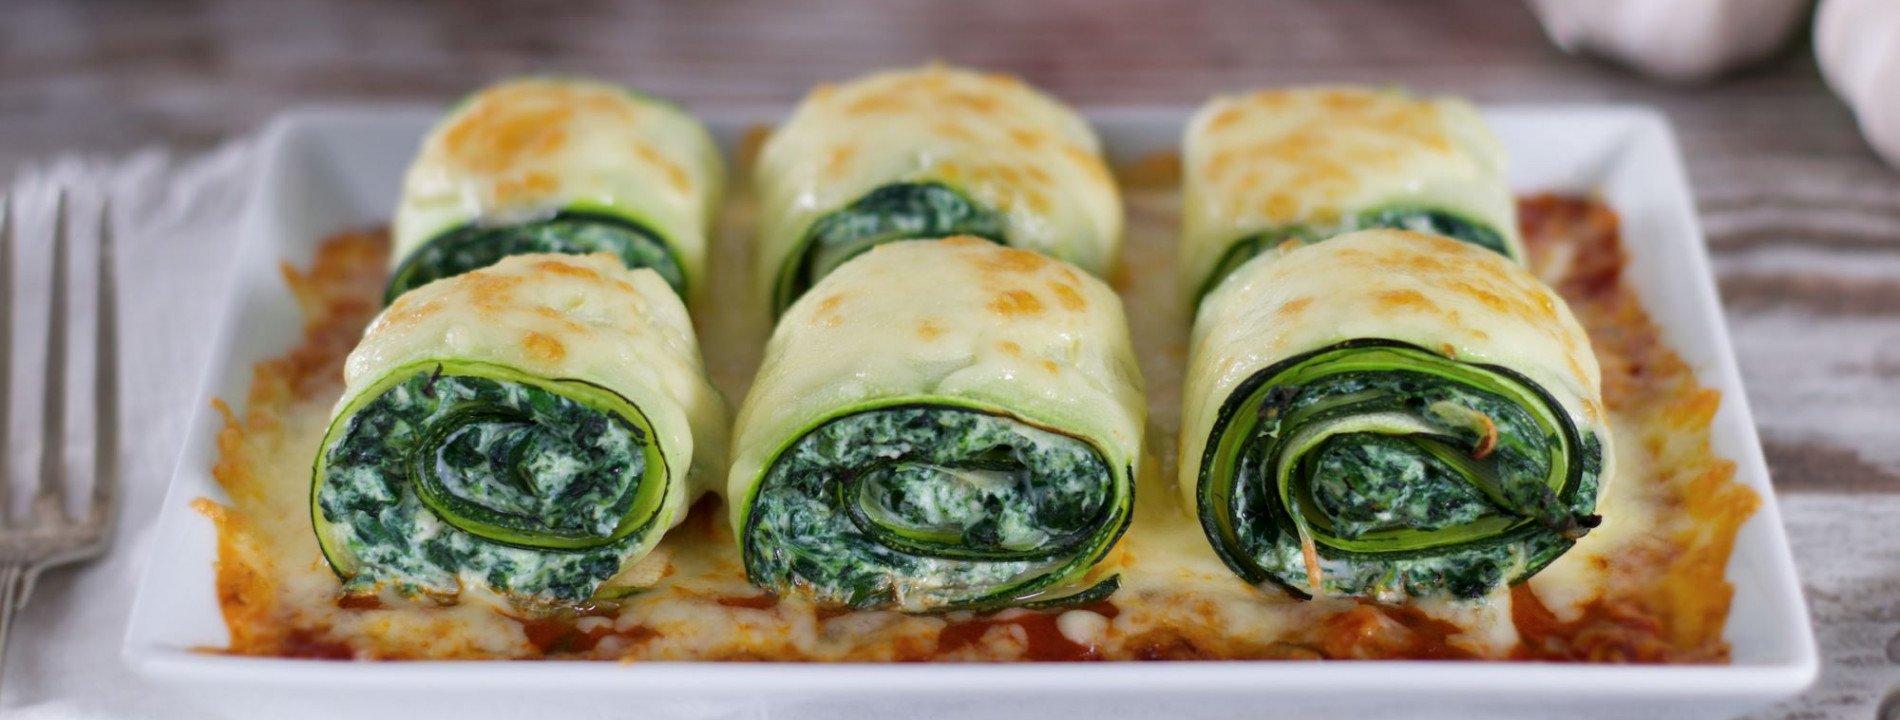 Ricotta and Spinach Stuffed Zucchini Cannelloni